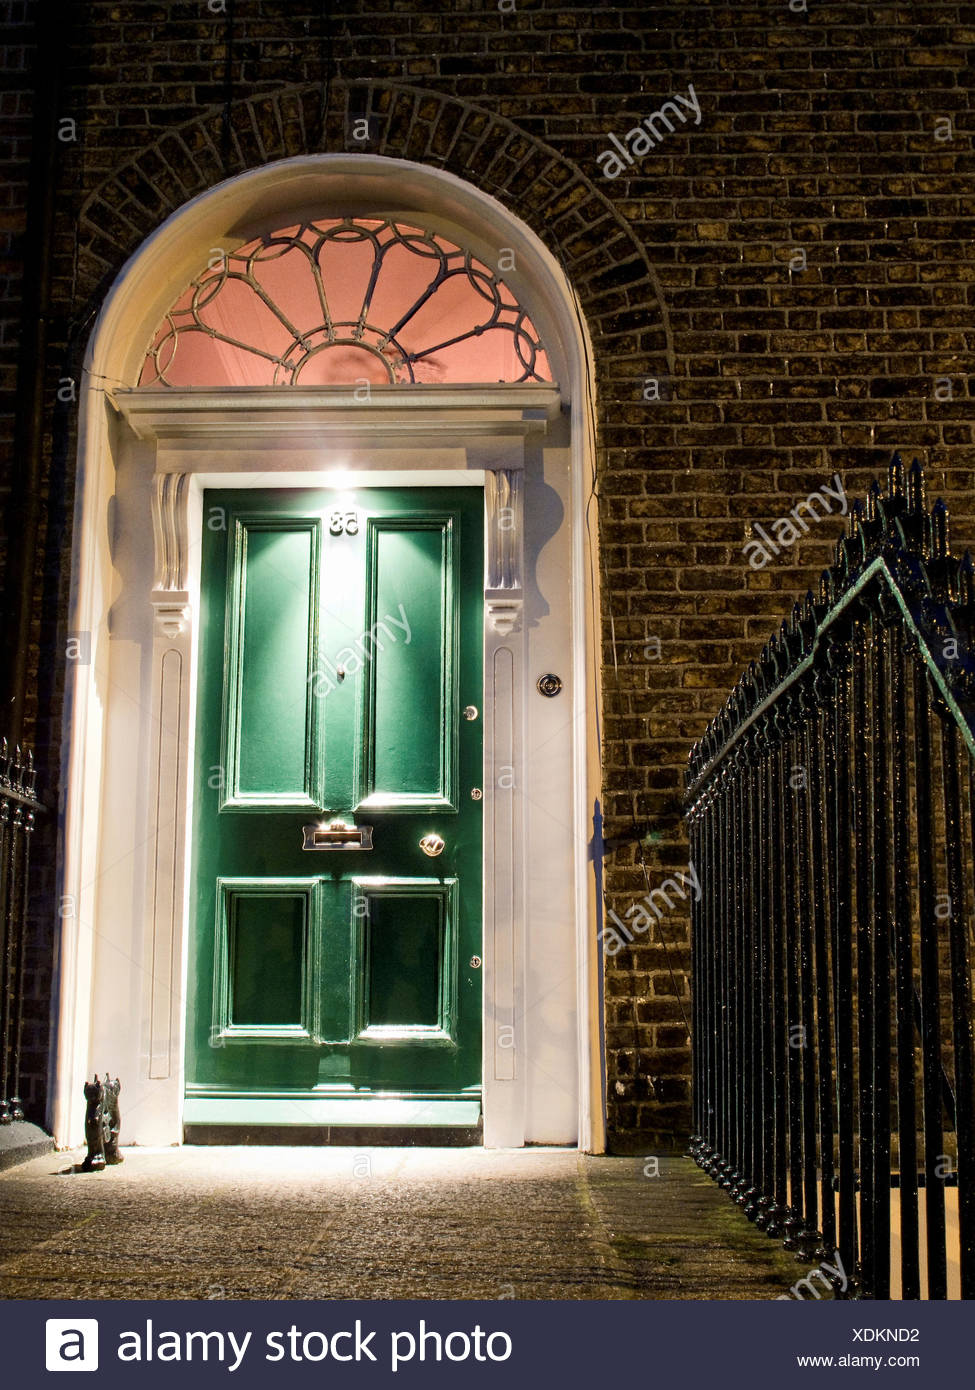 Typical Irish door in the night, Dublin, Ireland - Stock Image